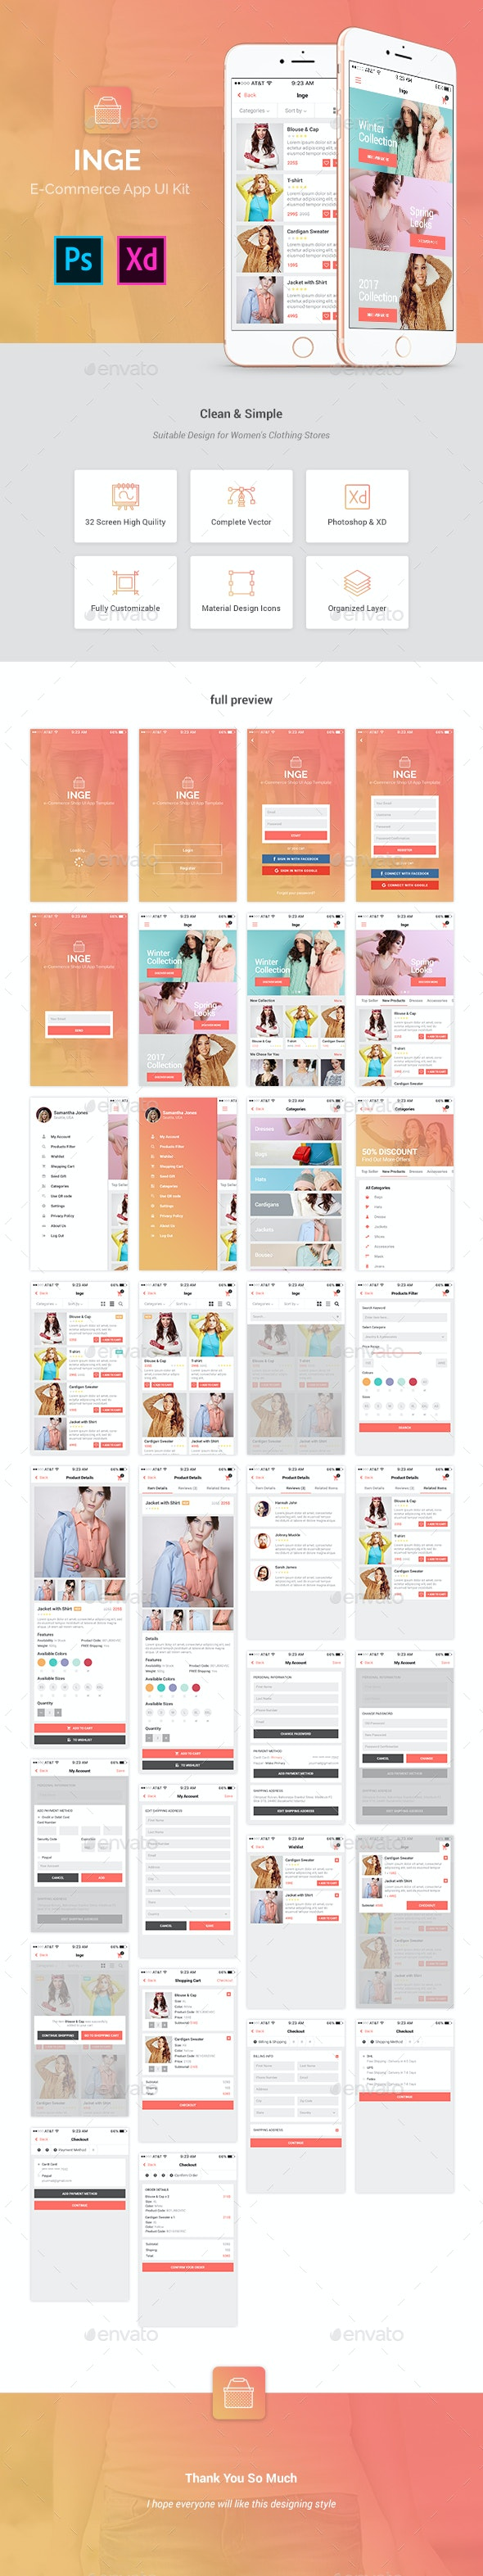 Inge E-Commerce App UI Kit - User Interfaces Web Elements